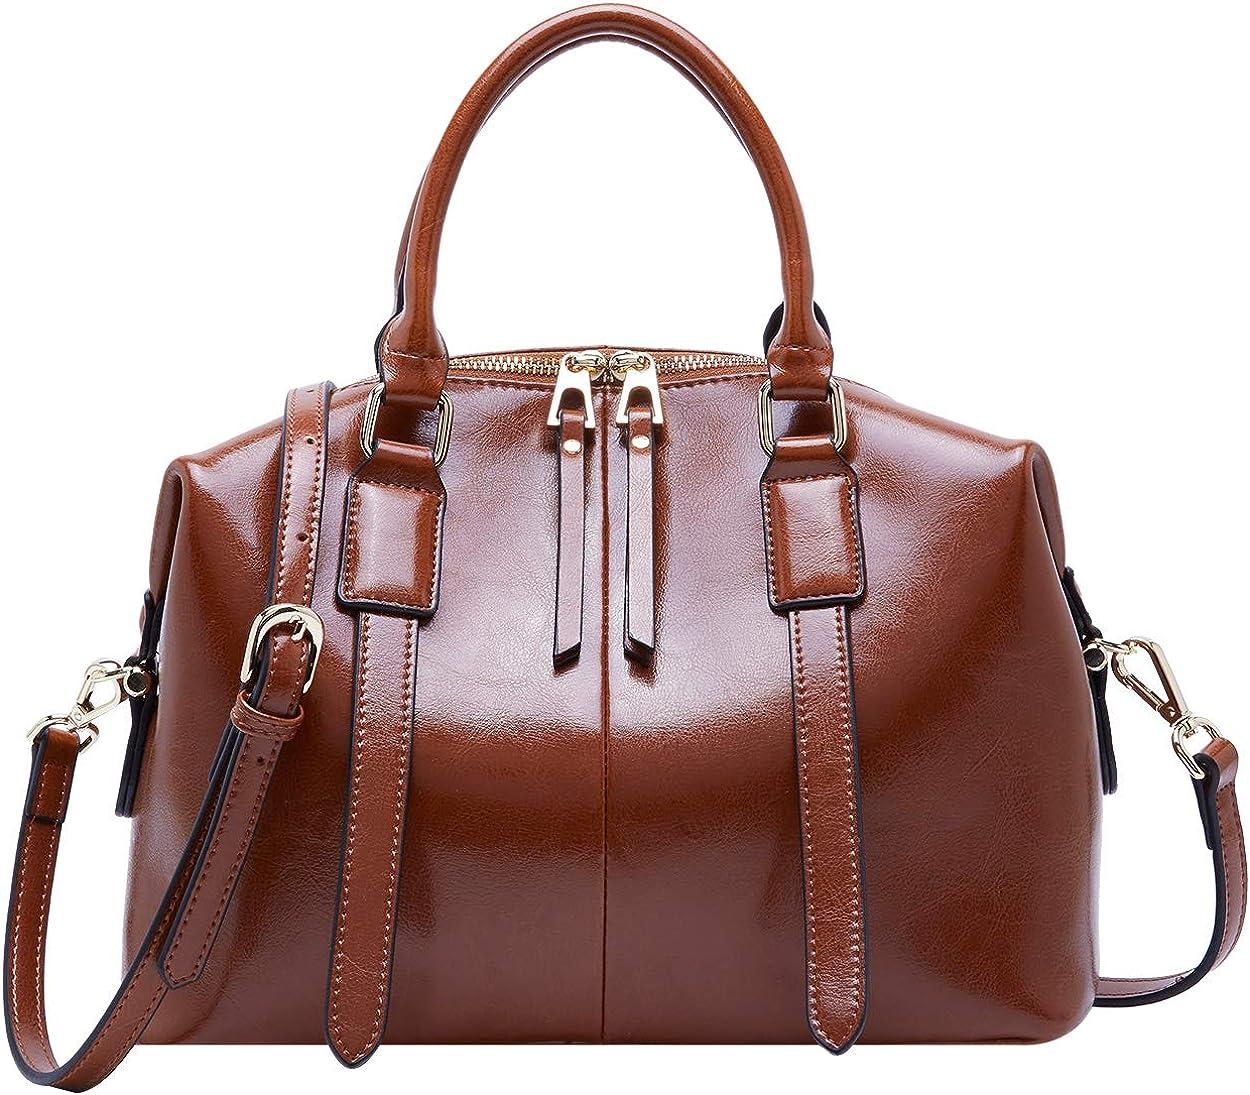 BOYATU Leather Handbag for Complete Free Shipping Cheap Women Satchel Bag Top Lad Handle Bags